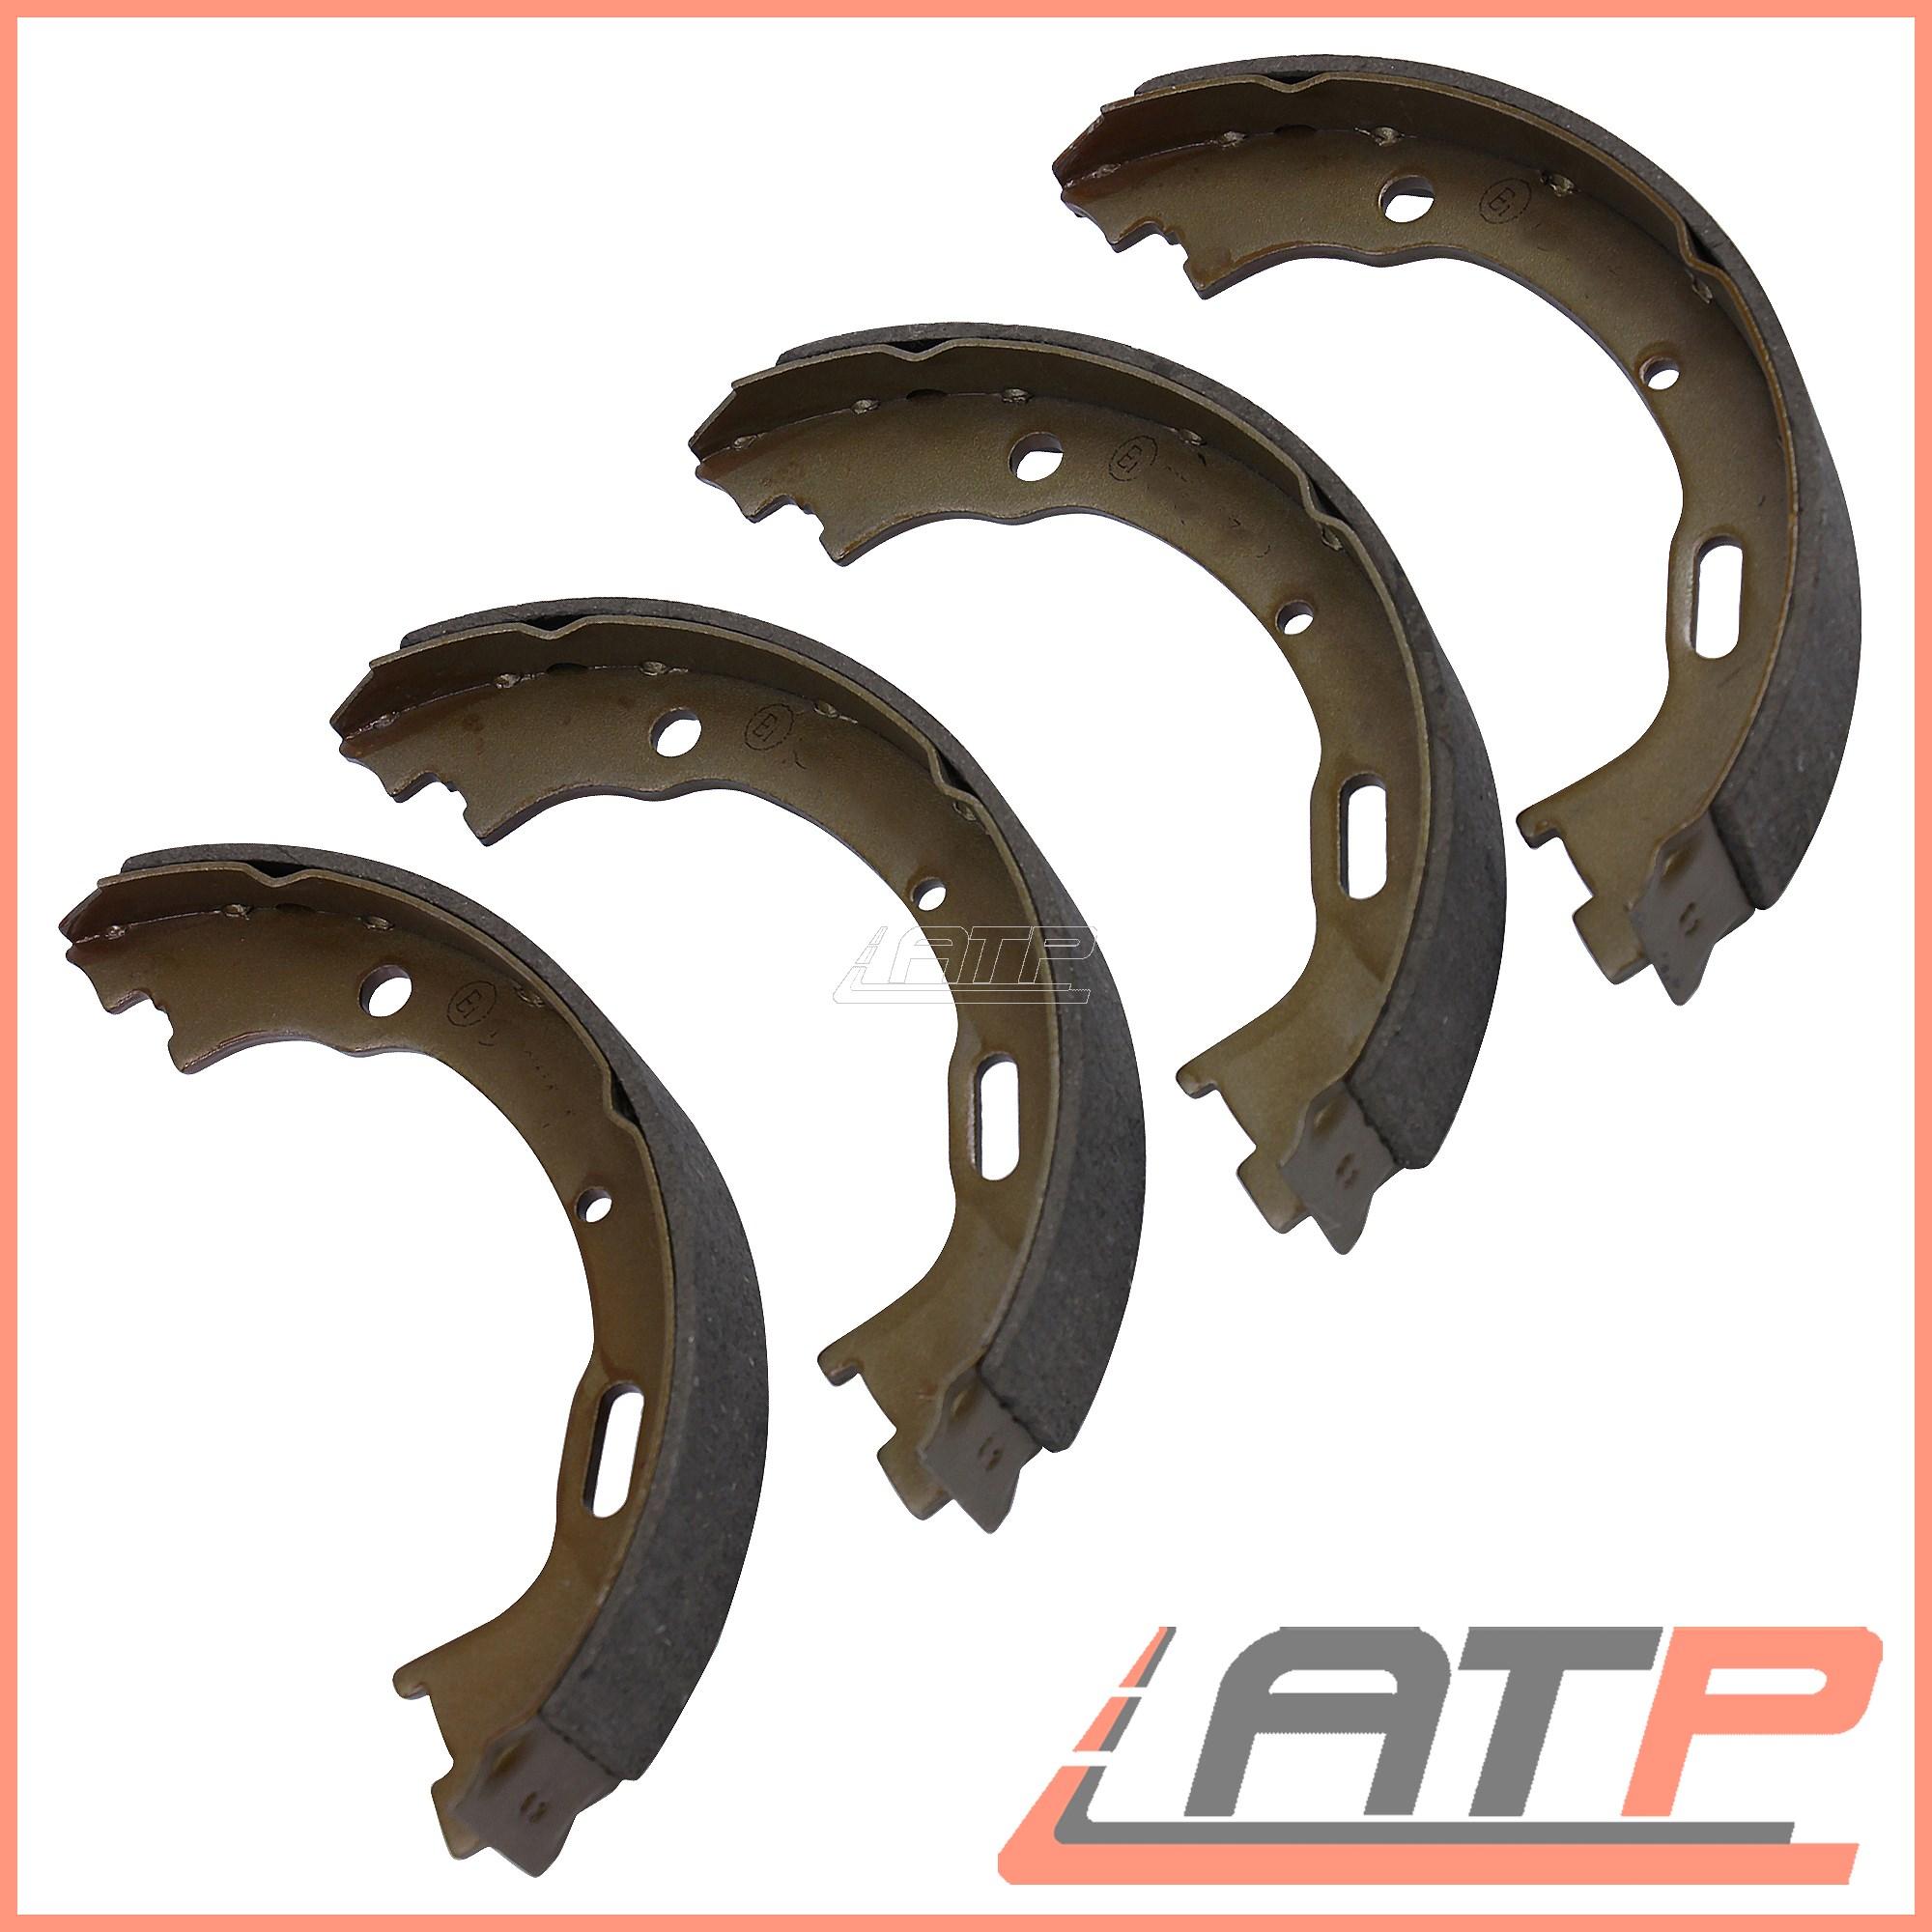 ENET Parking Brake Shoes Rear Handbrake Accessory Kit Fitting